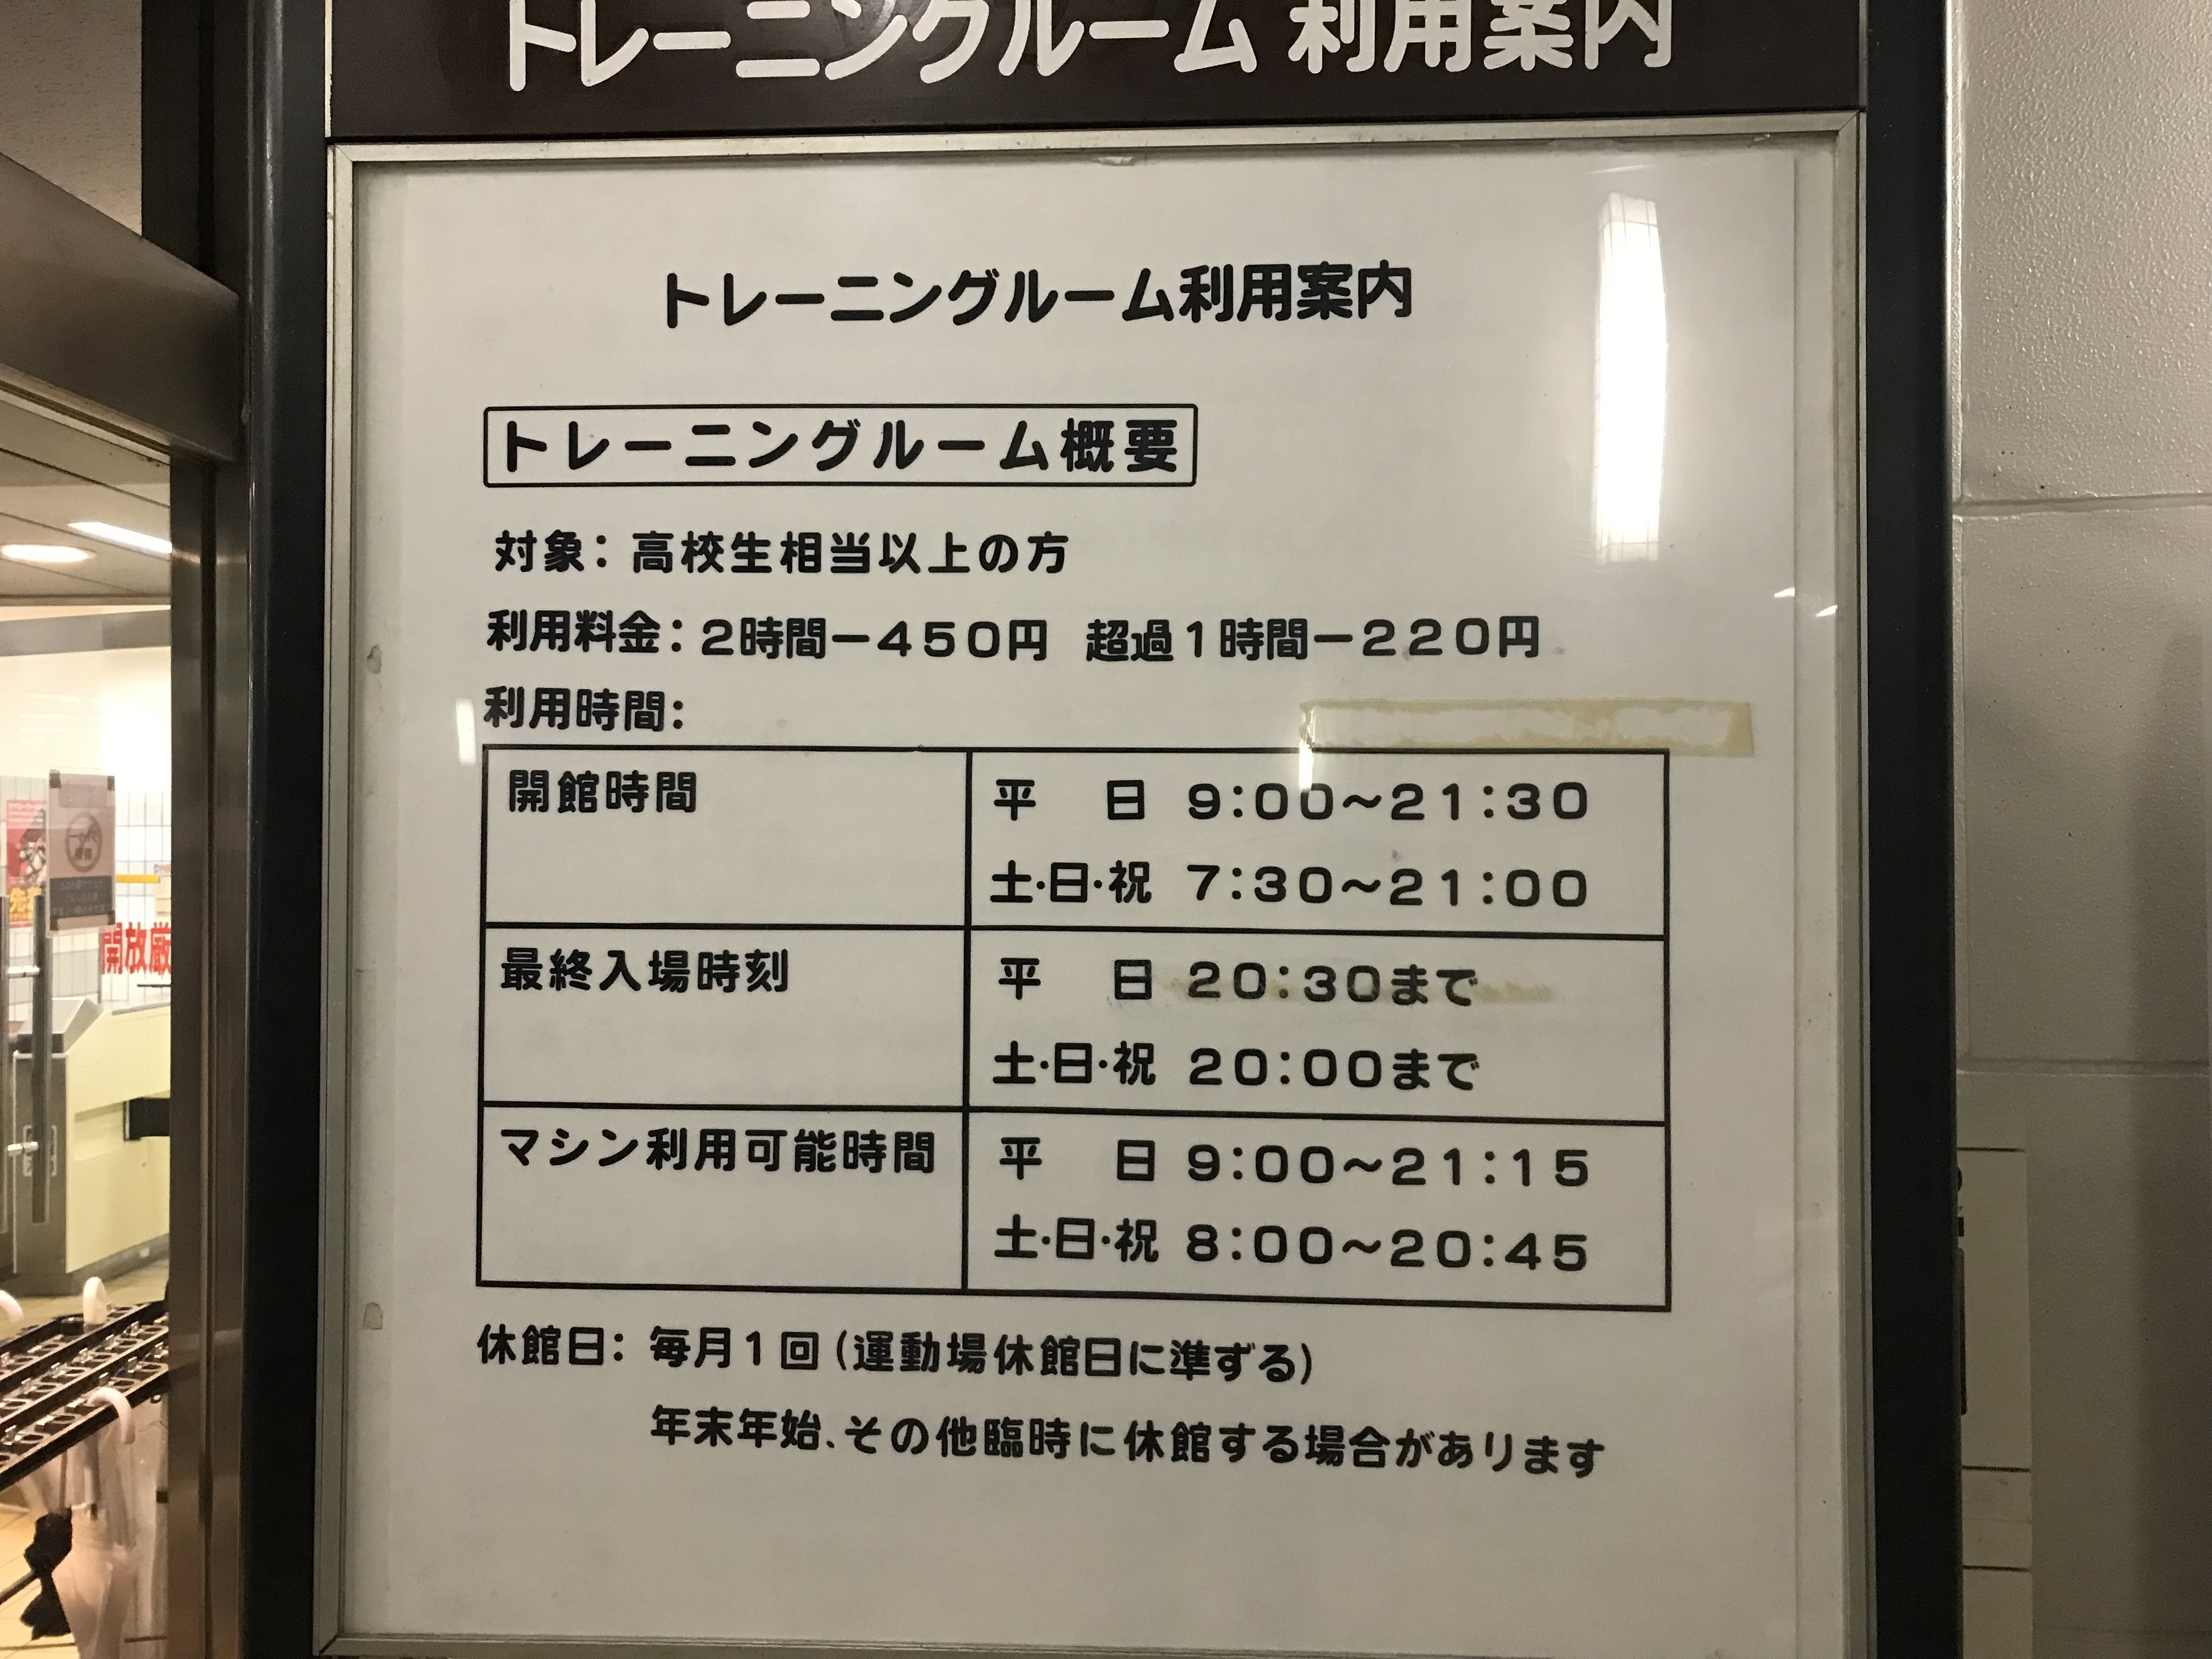 komazawa-training-room